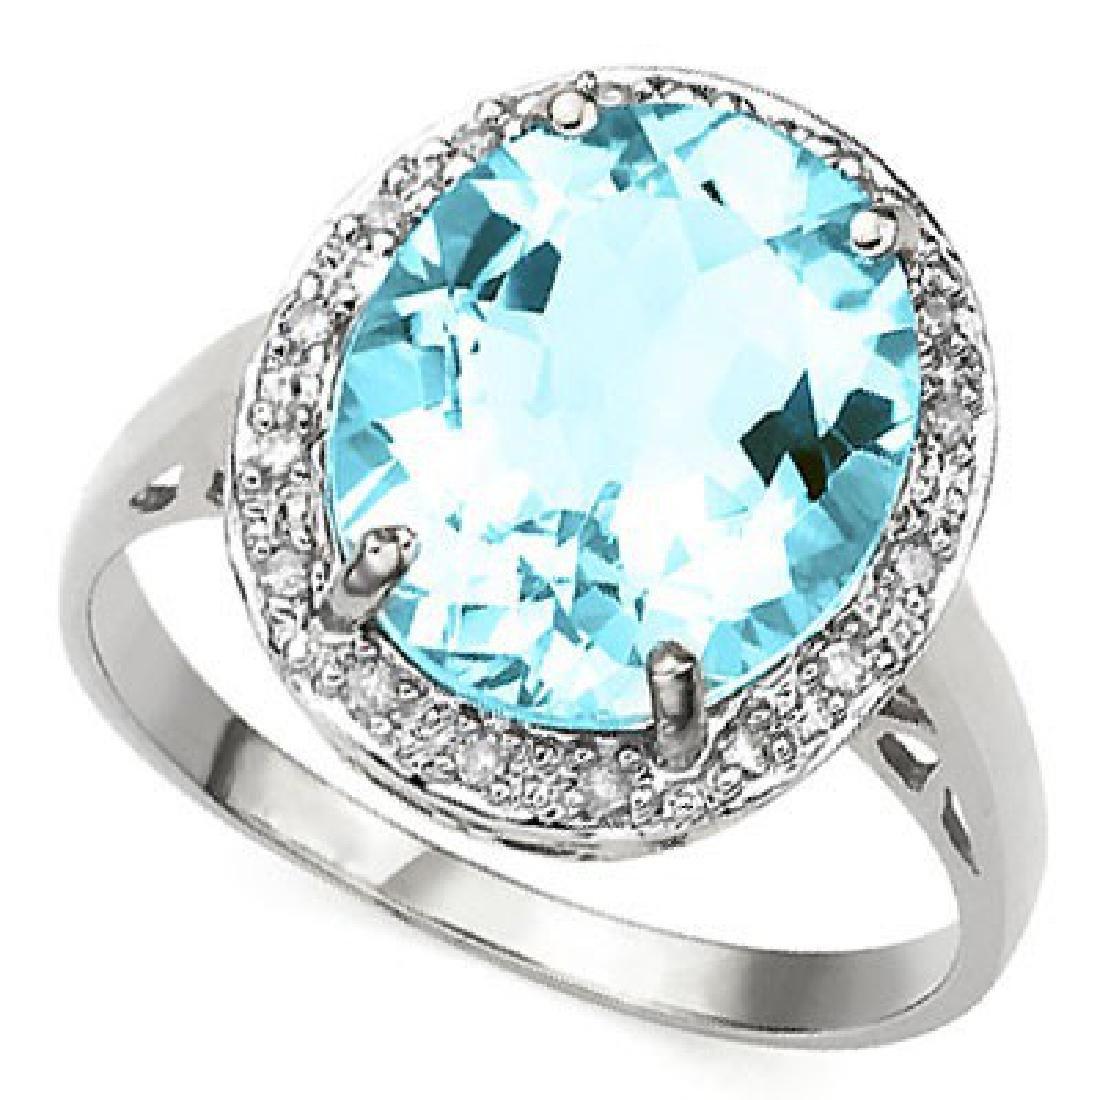 6 CARAT BABY SWISS BLUE TOPAZ & DIAMOND 925 STERLING SI